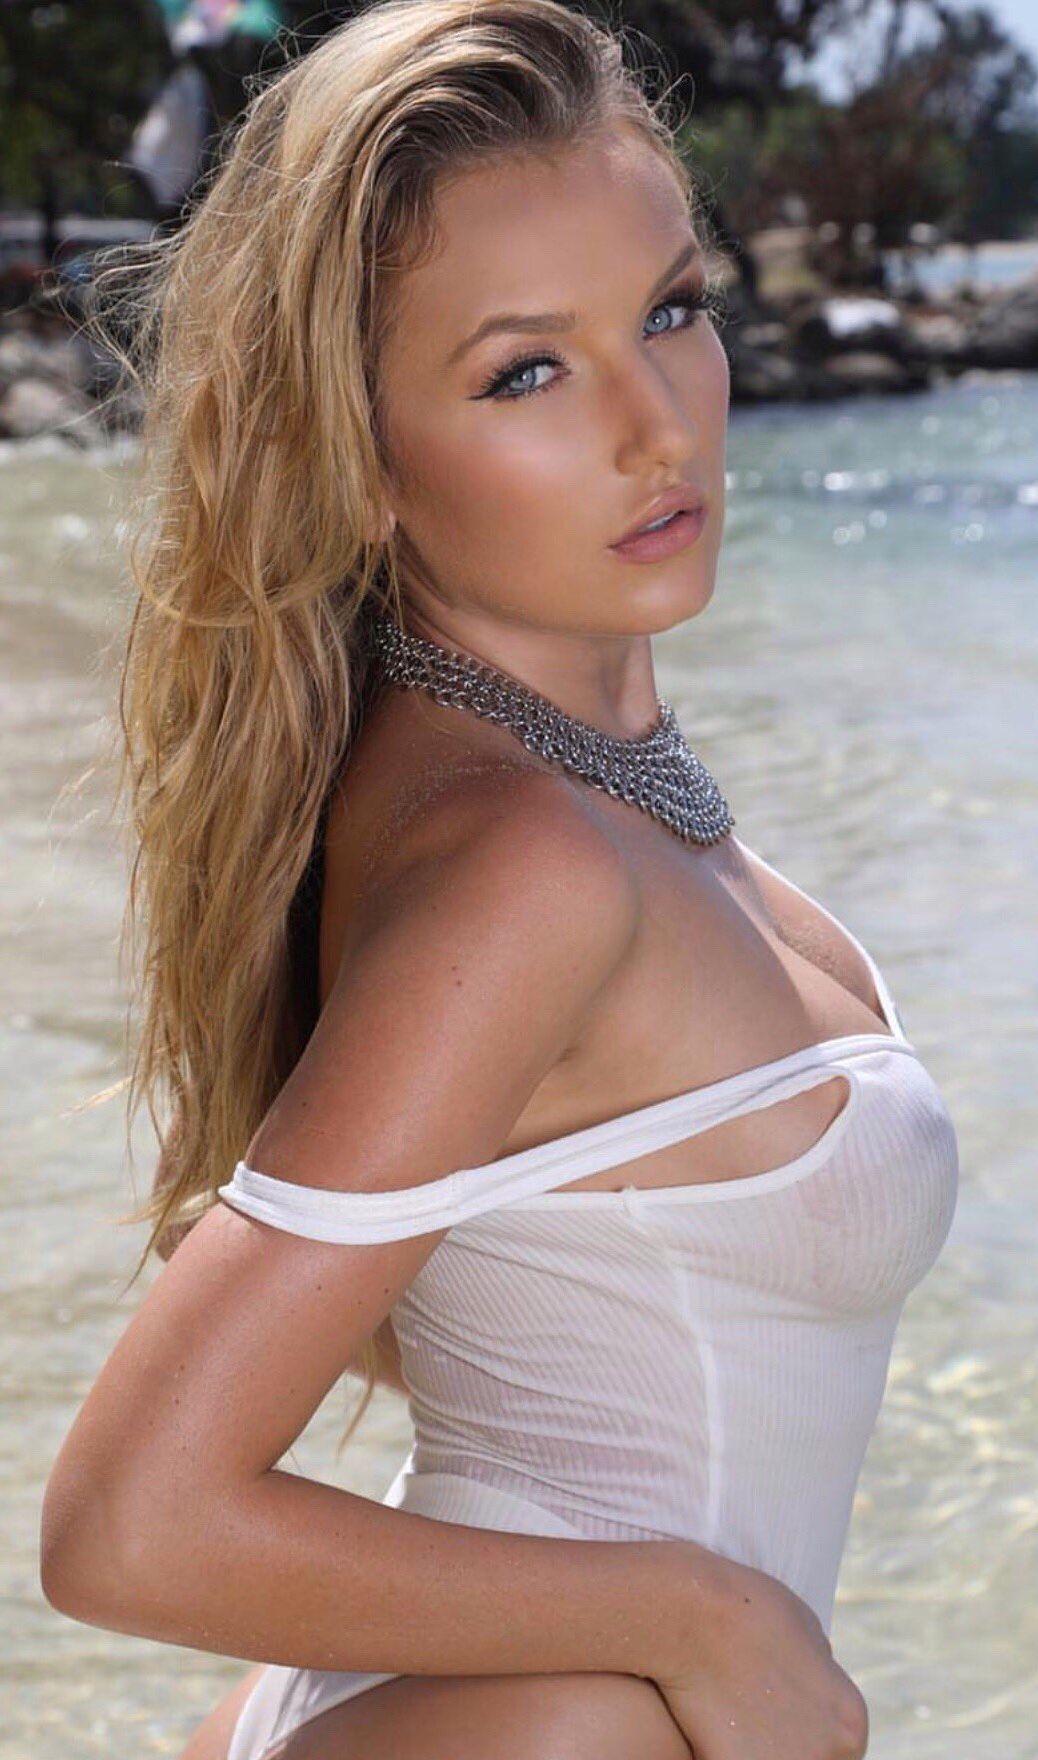 Trista Mikail nude (86 foto) Topless, Instagram, braless